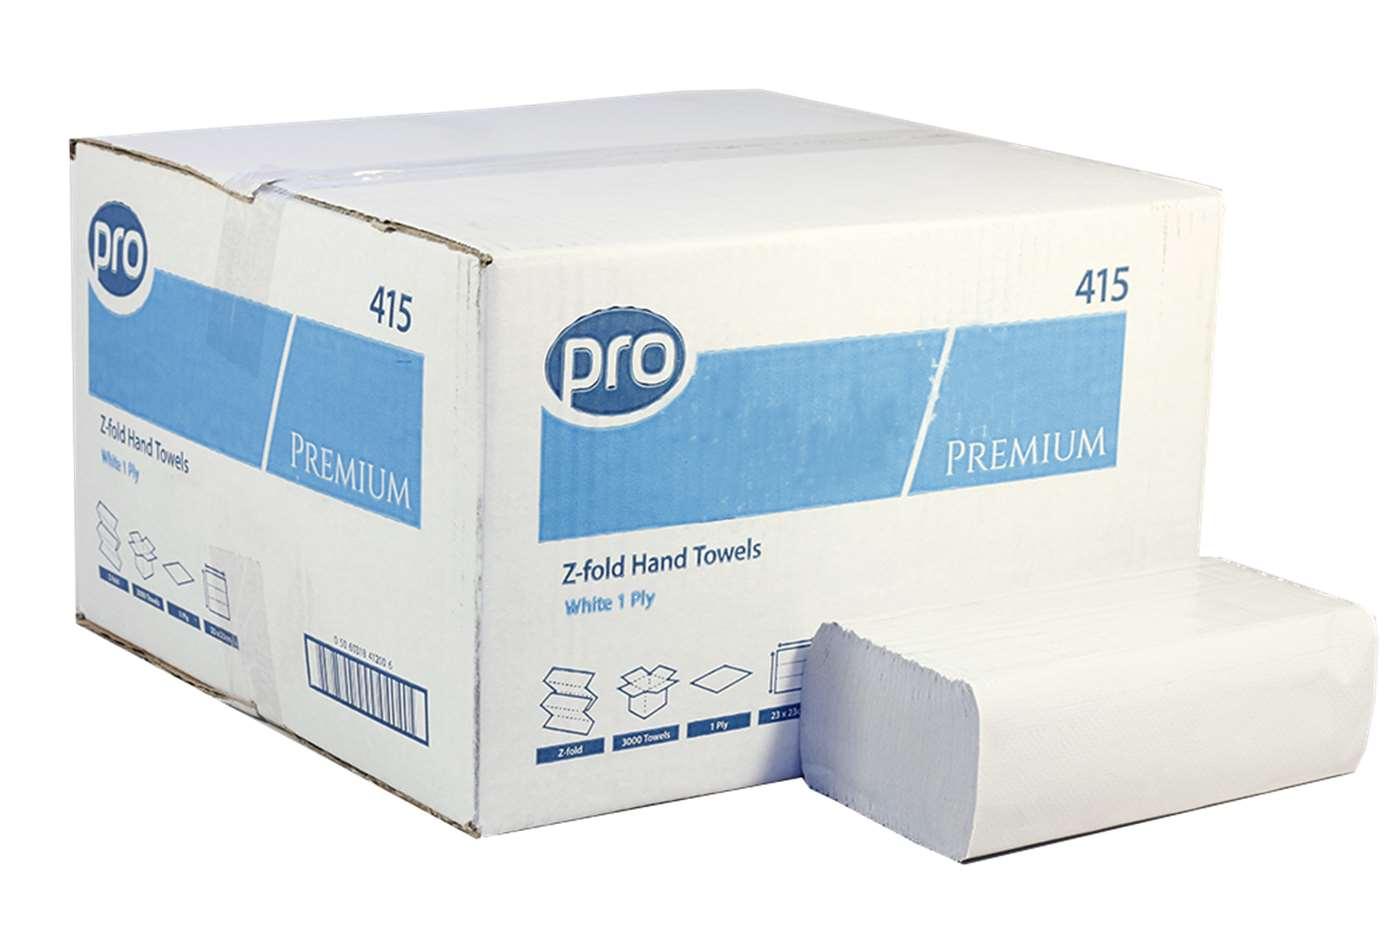 PRO Z-Fold White 1 Ply Paper Towel